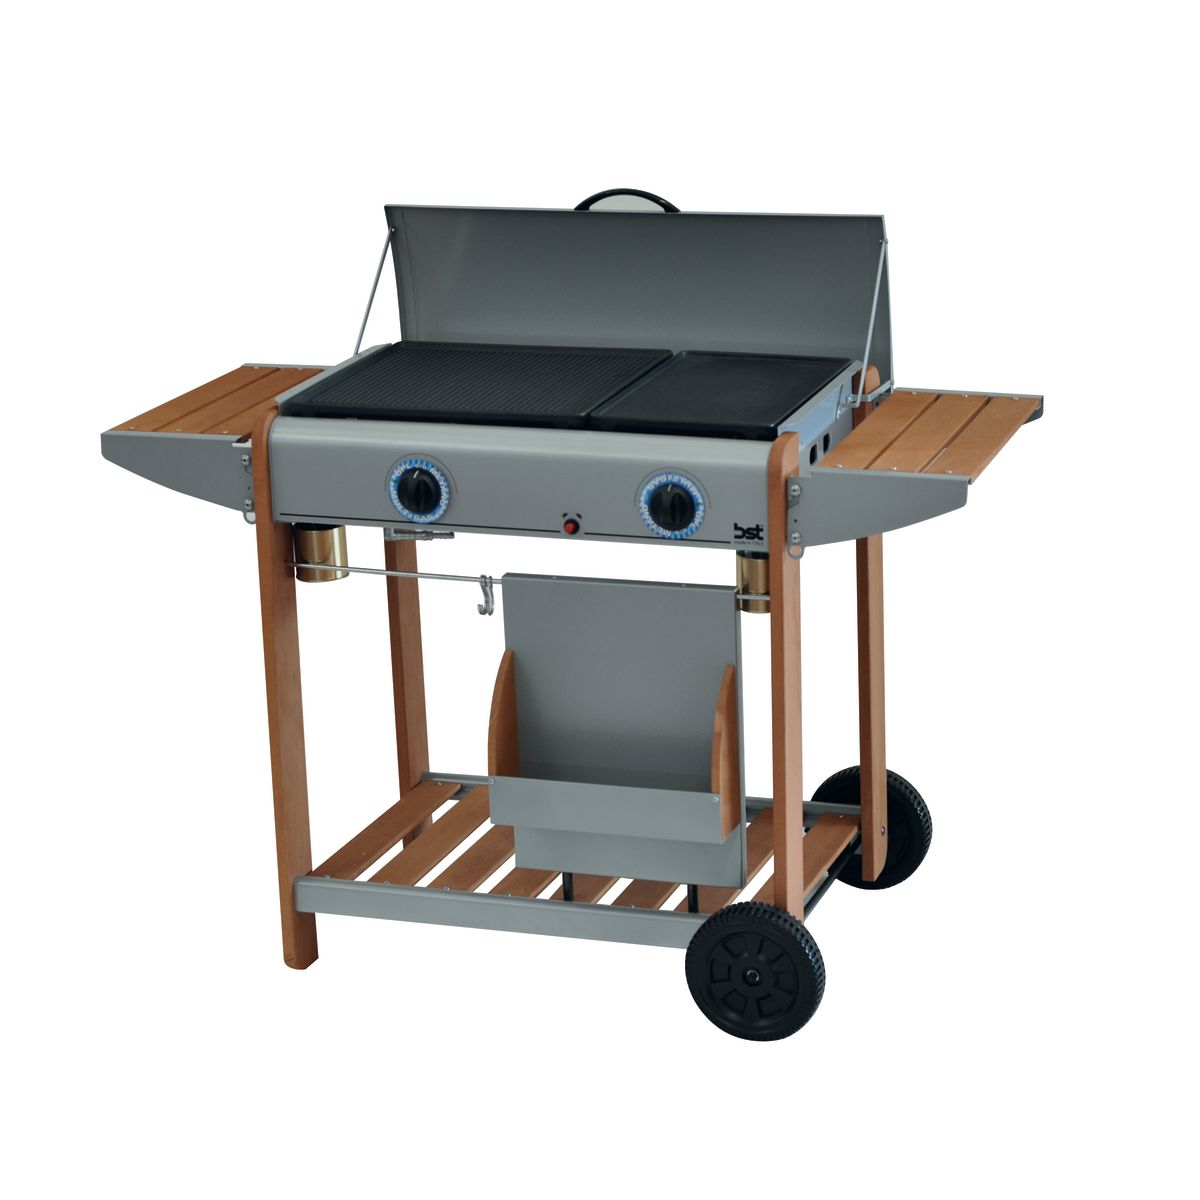 barbecue en pierre pas cher leroy merlin elegant barbecue gaz carrefour online tours ciment. Black Bedroom Furniture Sets. Home Design Ideas